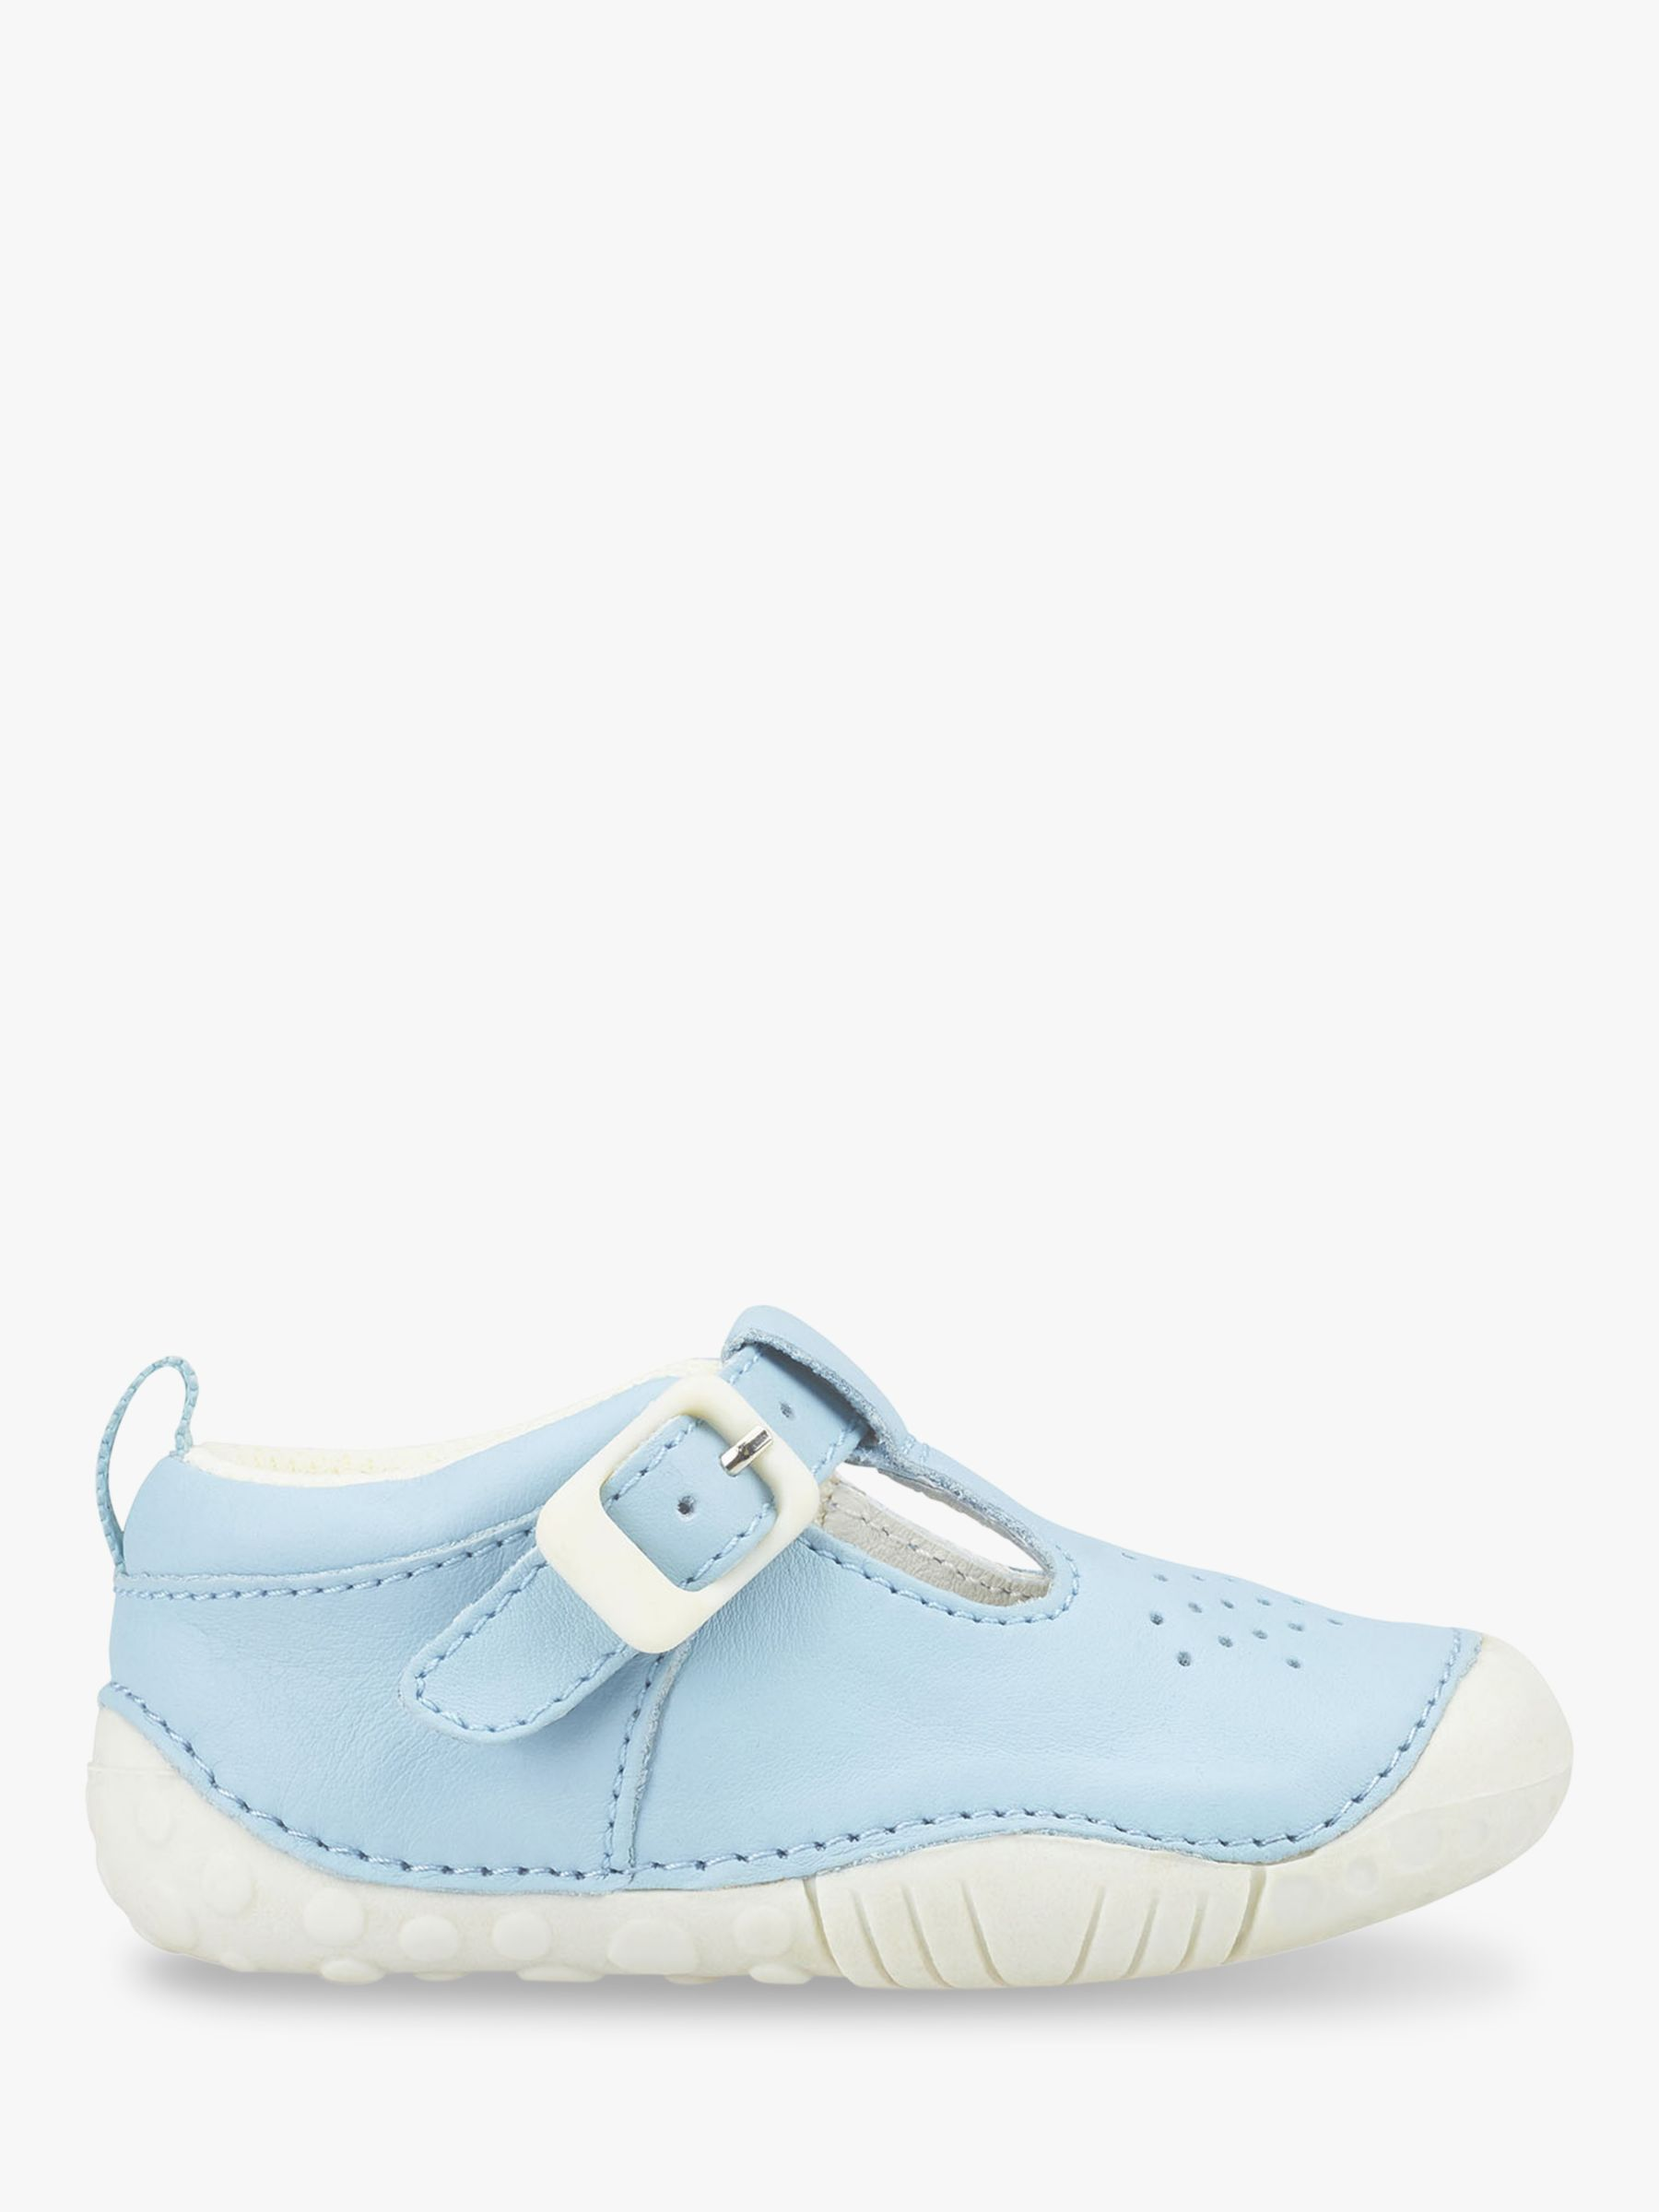 Start-Rite Start-rite Children's Jack T-Bar Buckle Pre-Walker Shoes, Pale Blue